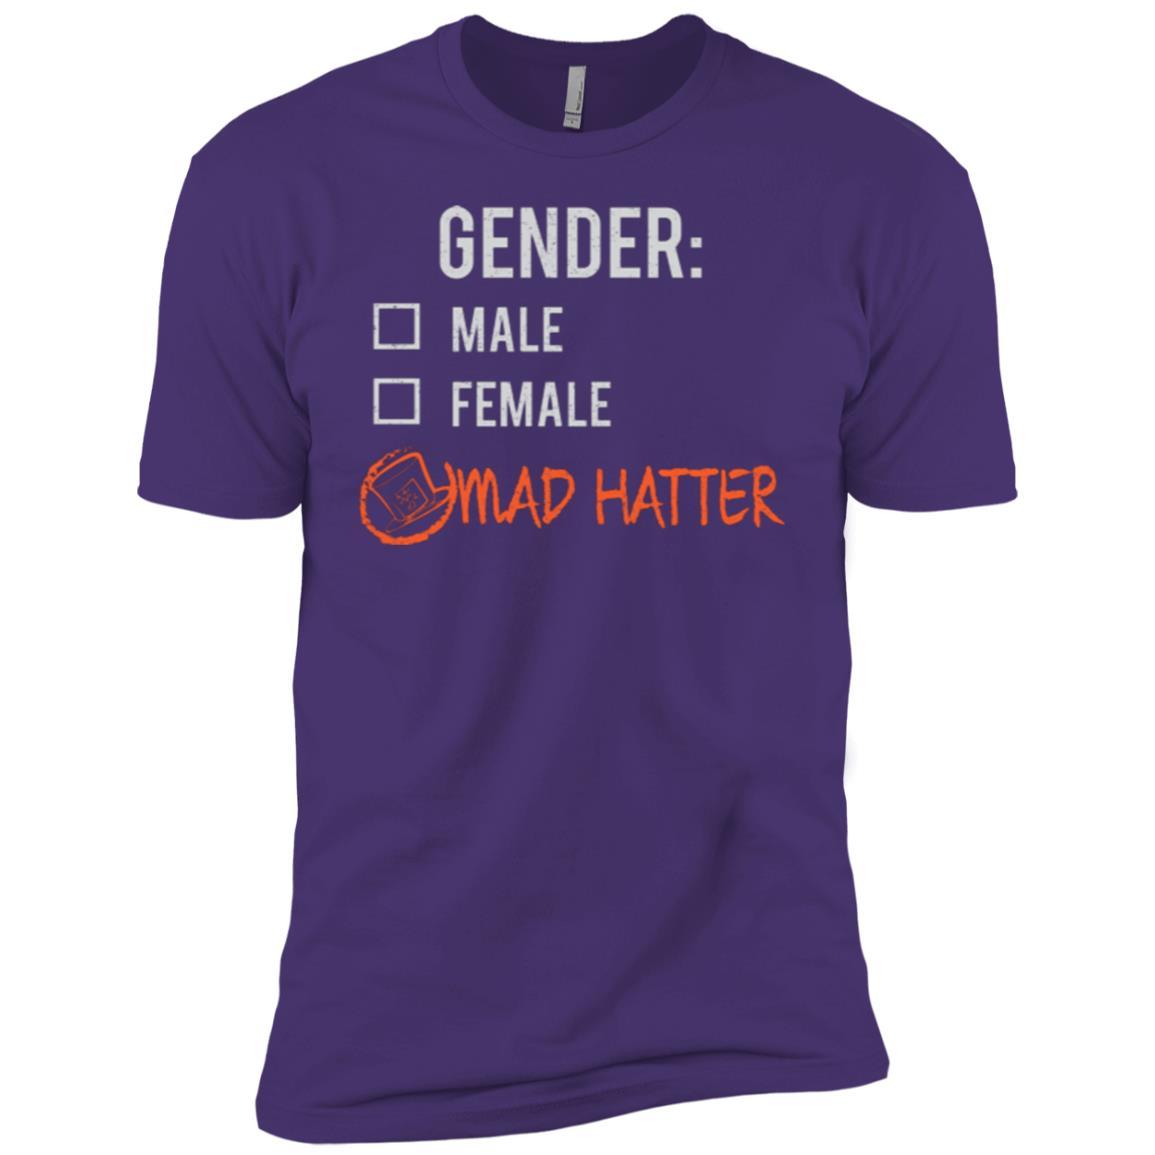 Male Female Mad Hatter Gender Nonbinary Trans Men Short Sleeve T-Shirt